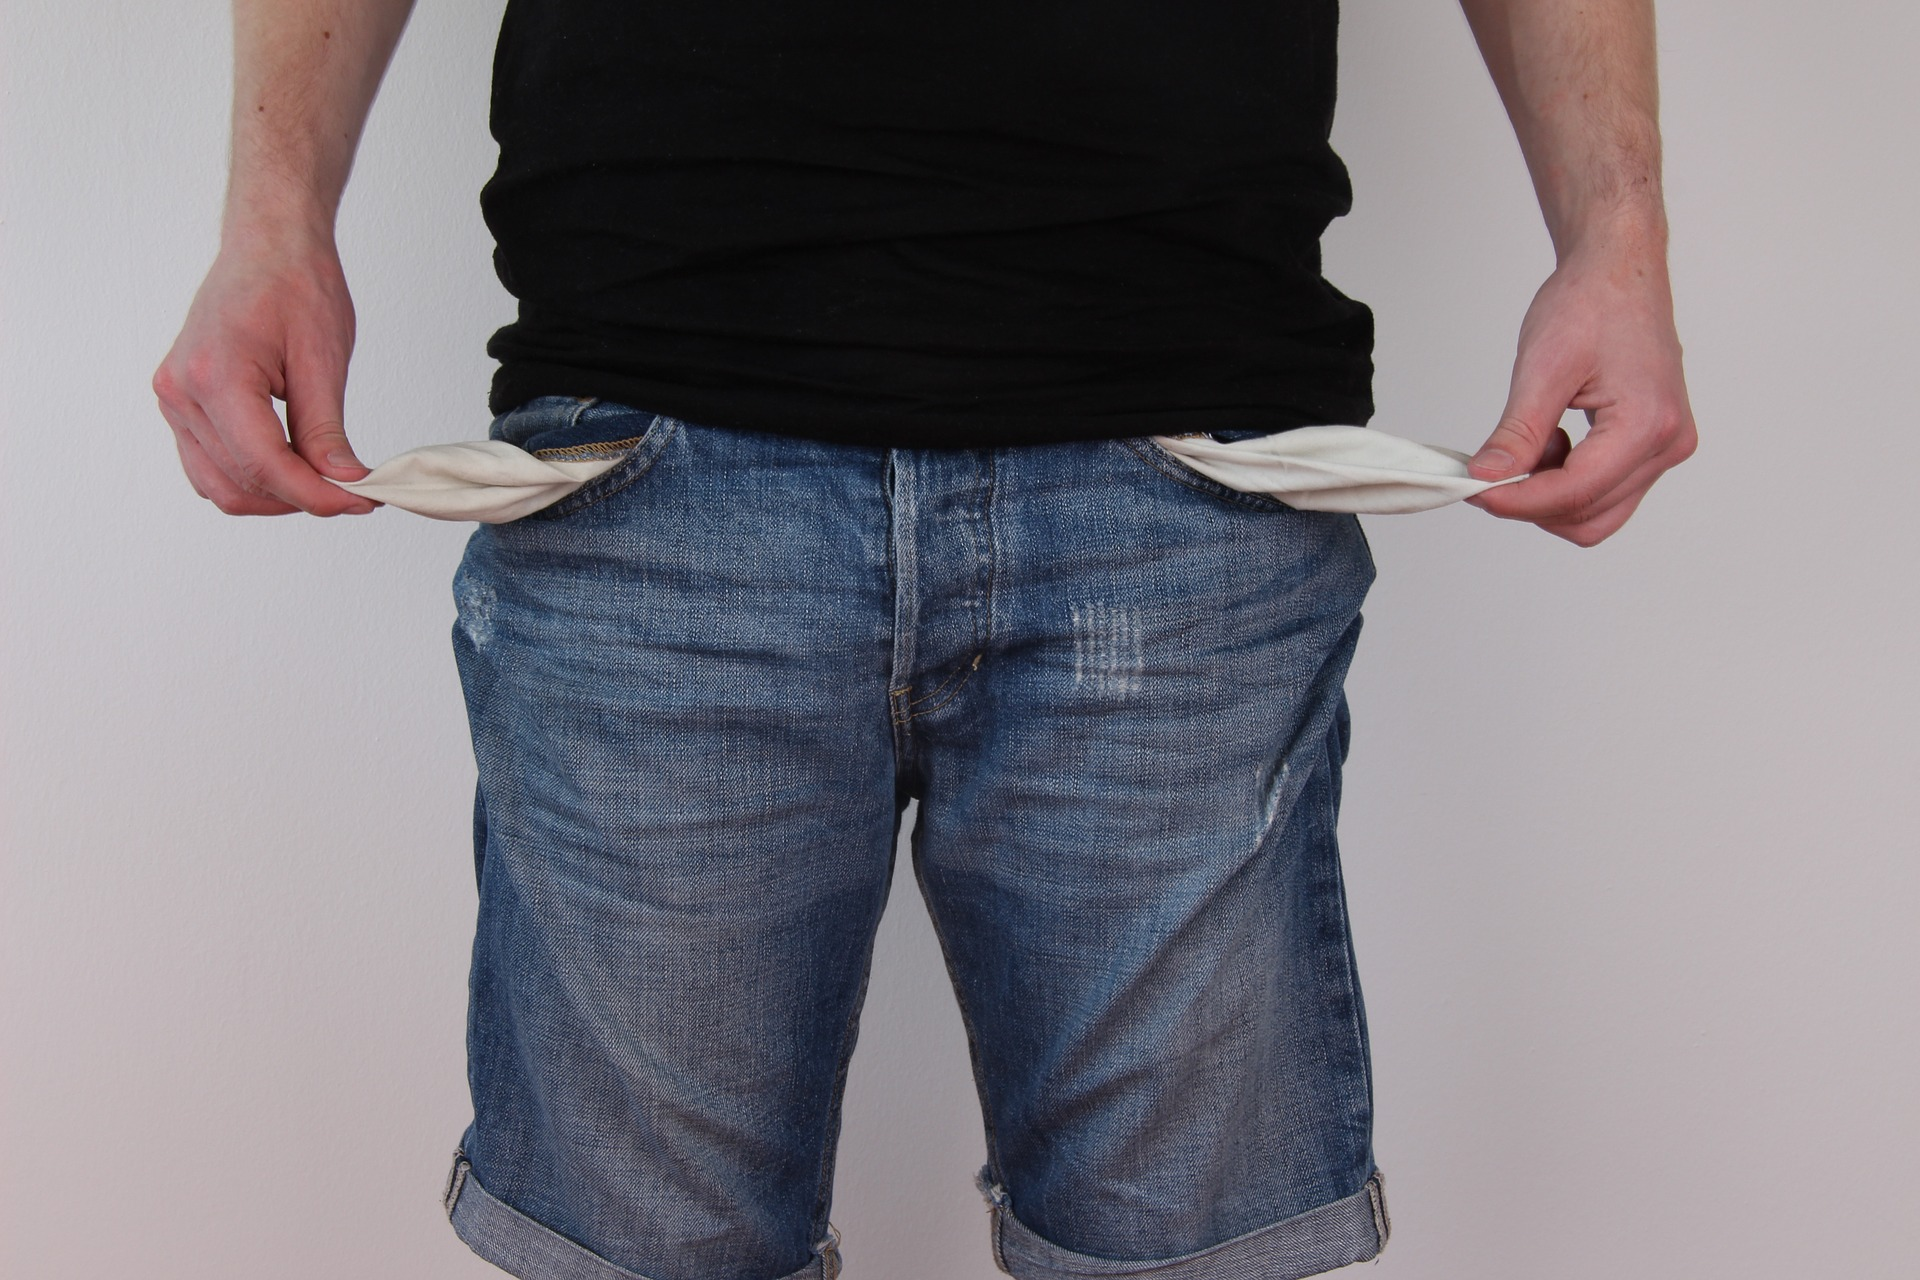 trouser-pockets-1439412_1920 (2)